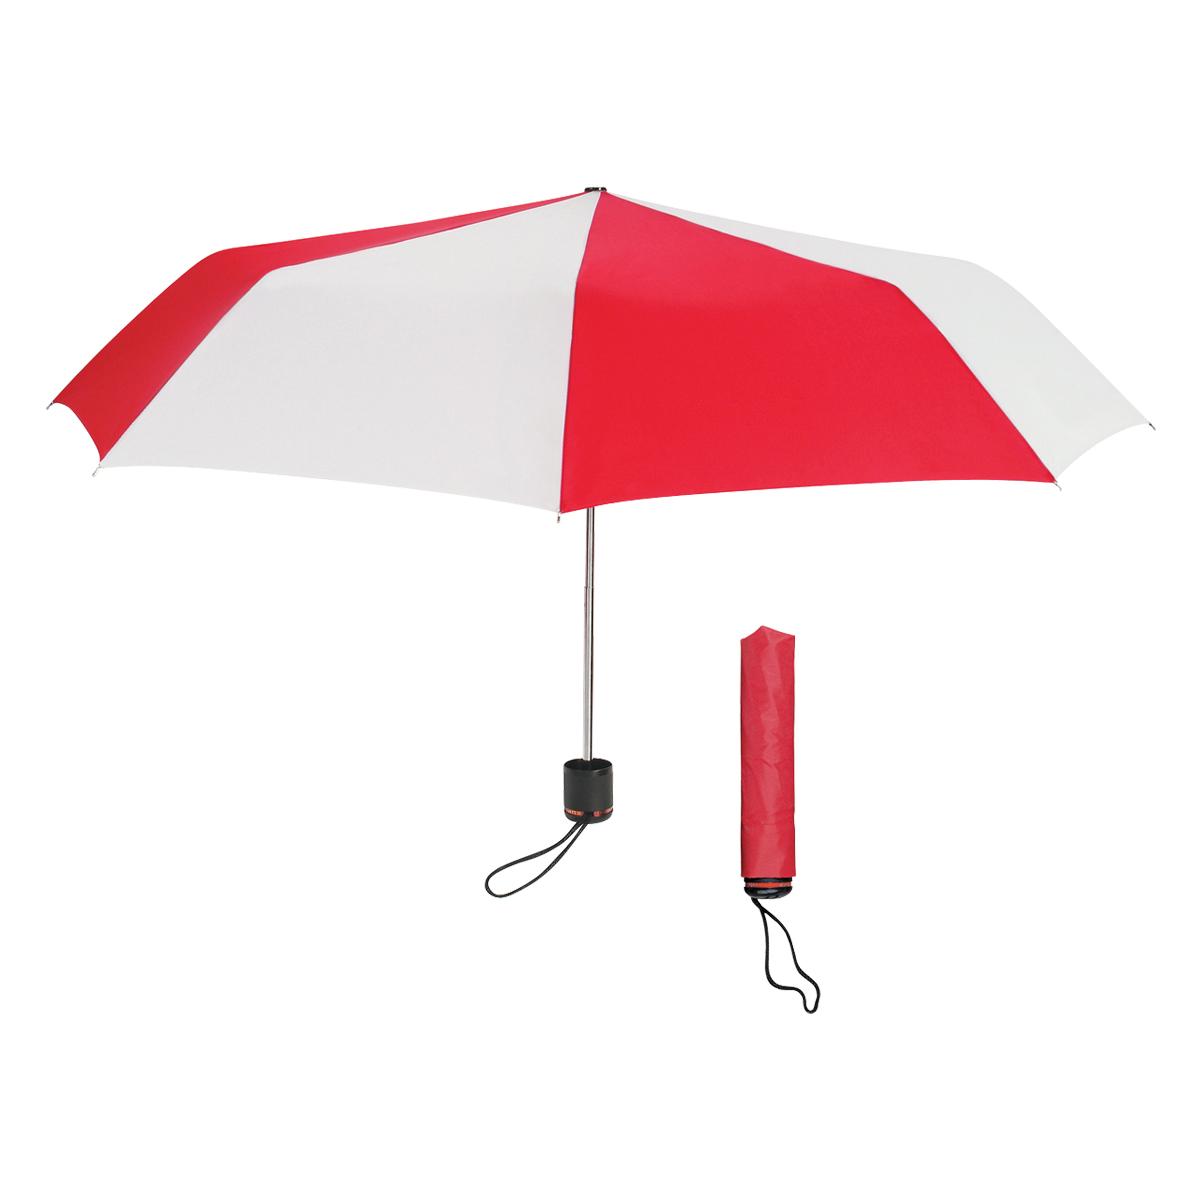 4122 - Paraguas de arco grande tamaño mini